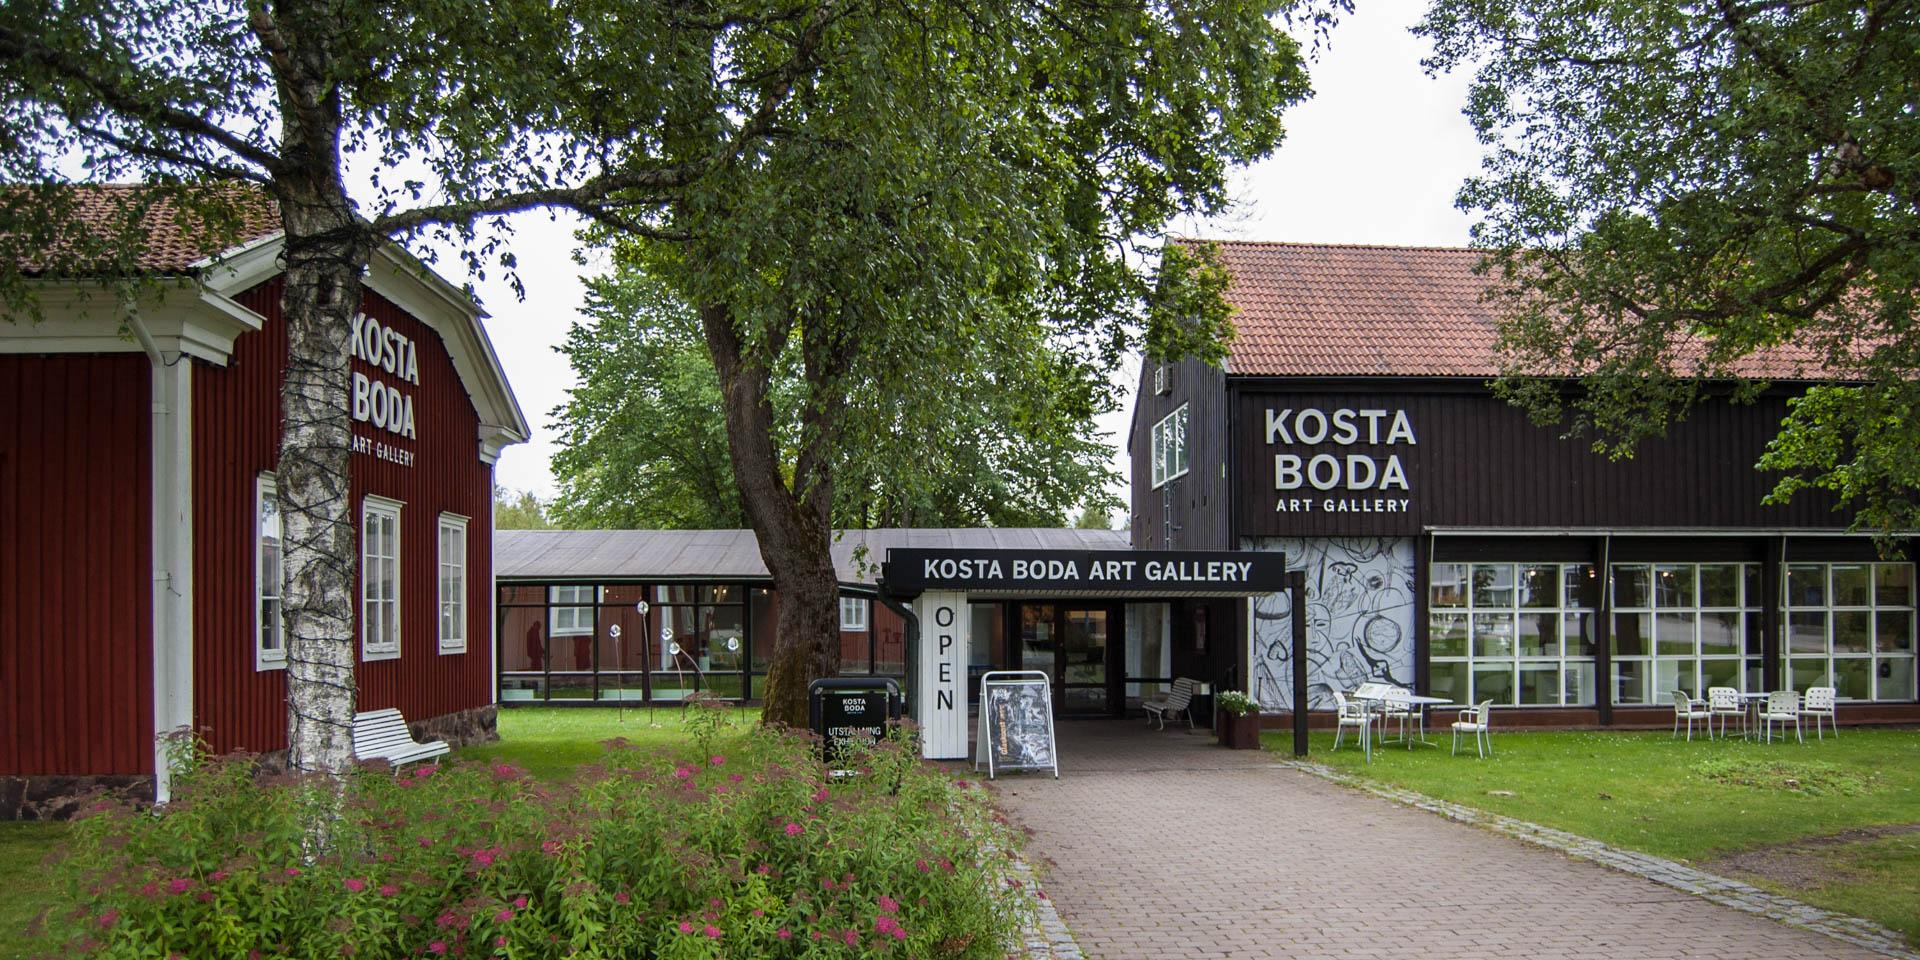 Kosta Boda Art Gallery 2015